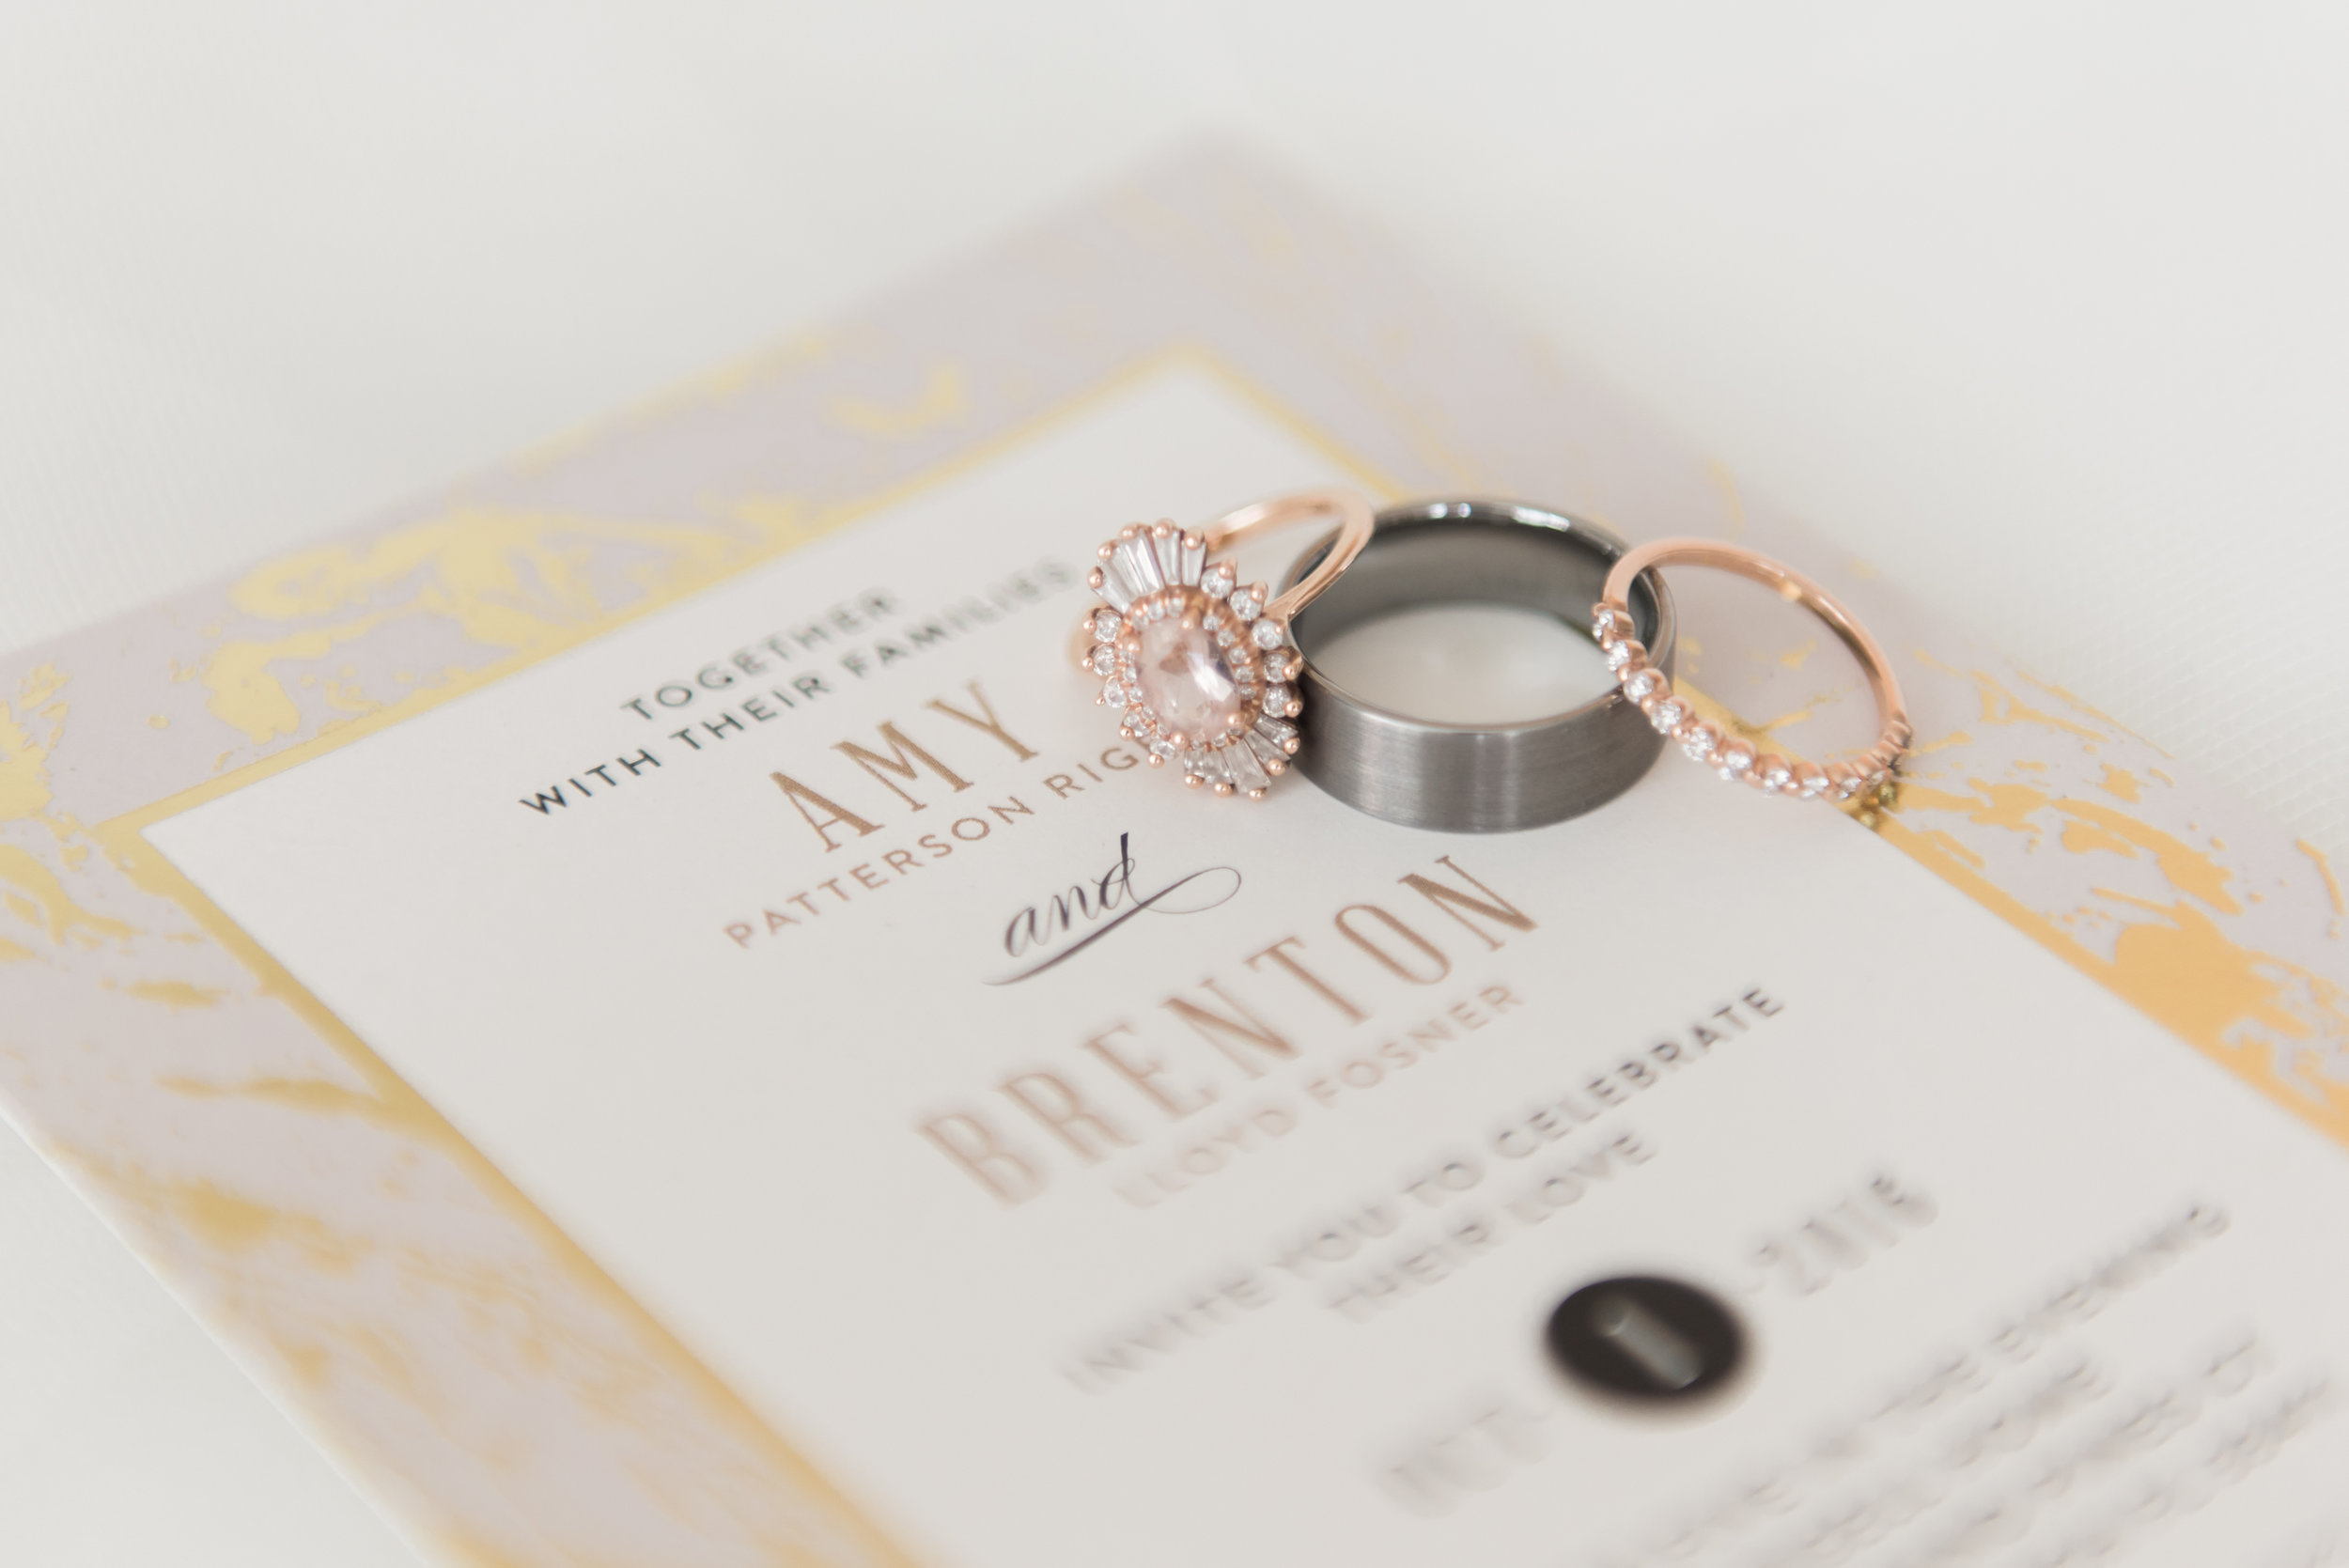 heidi-gibson-engagement-ring.jpg